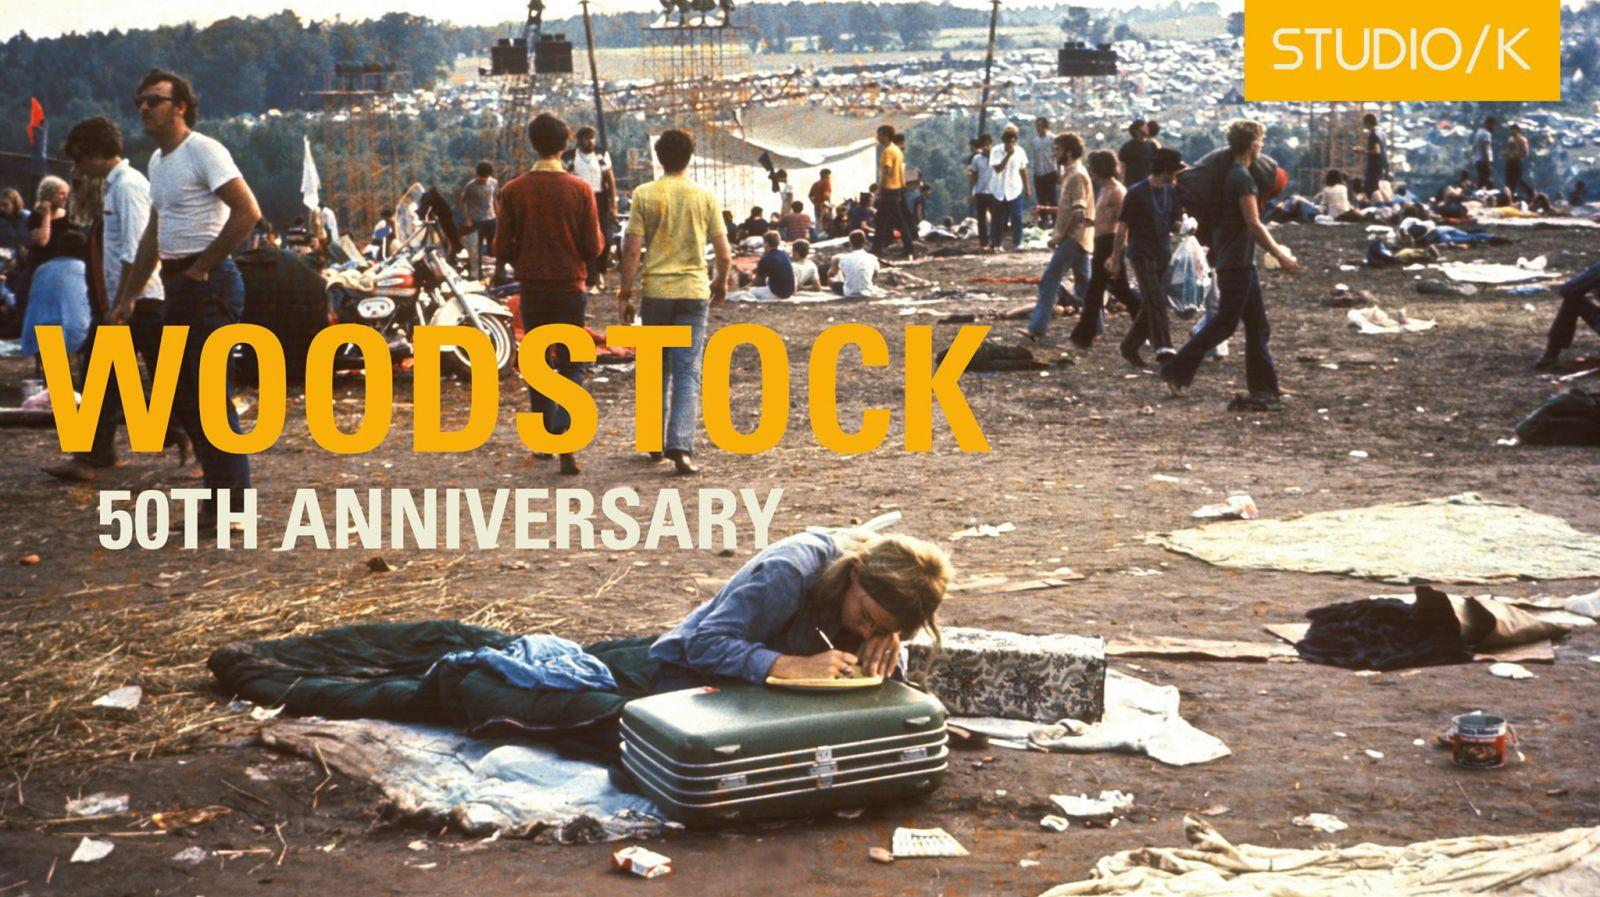 Woodstock 50th Anniversary (1970)